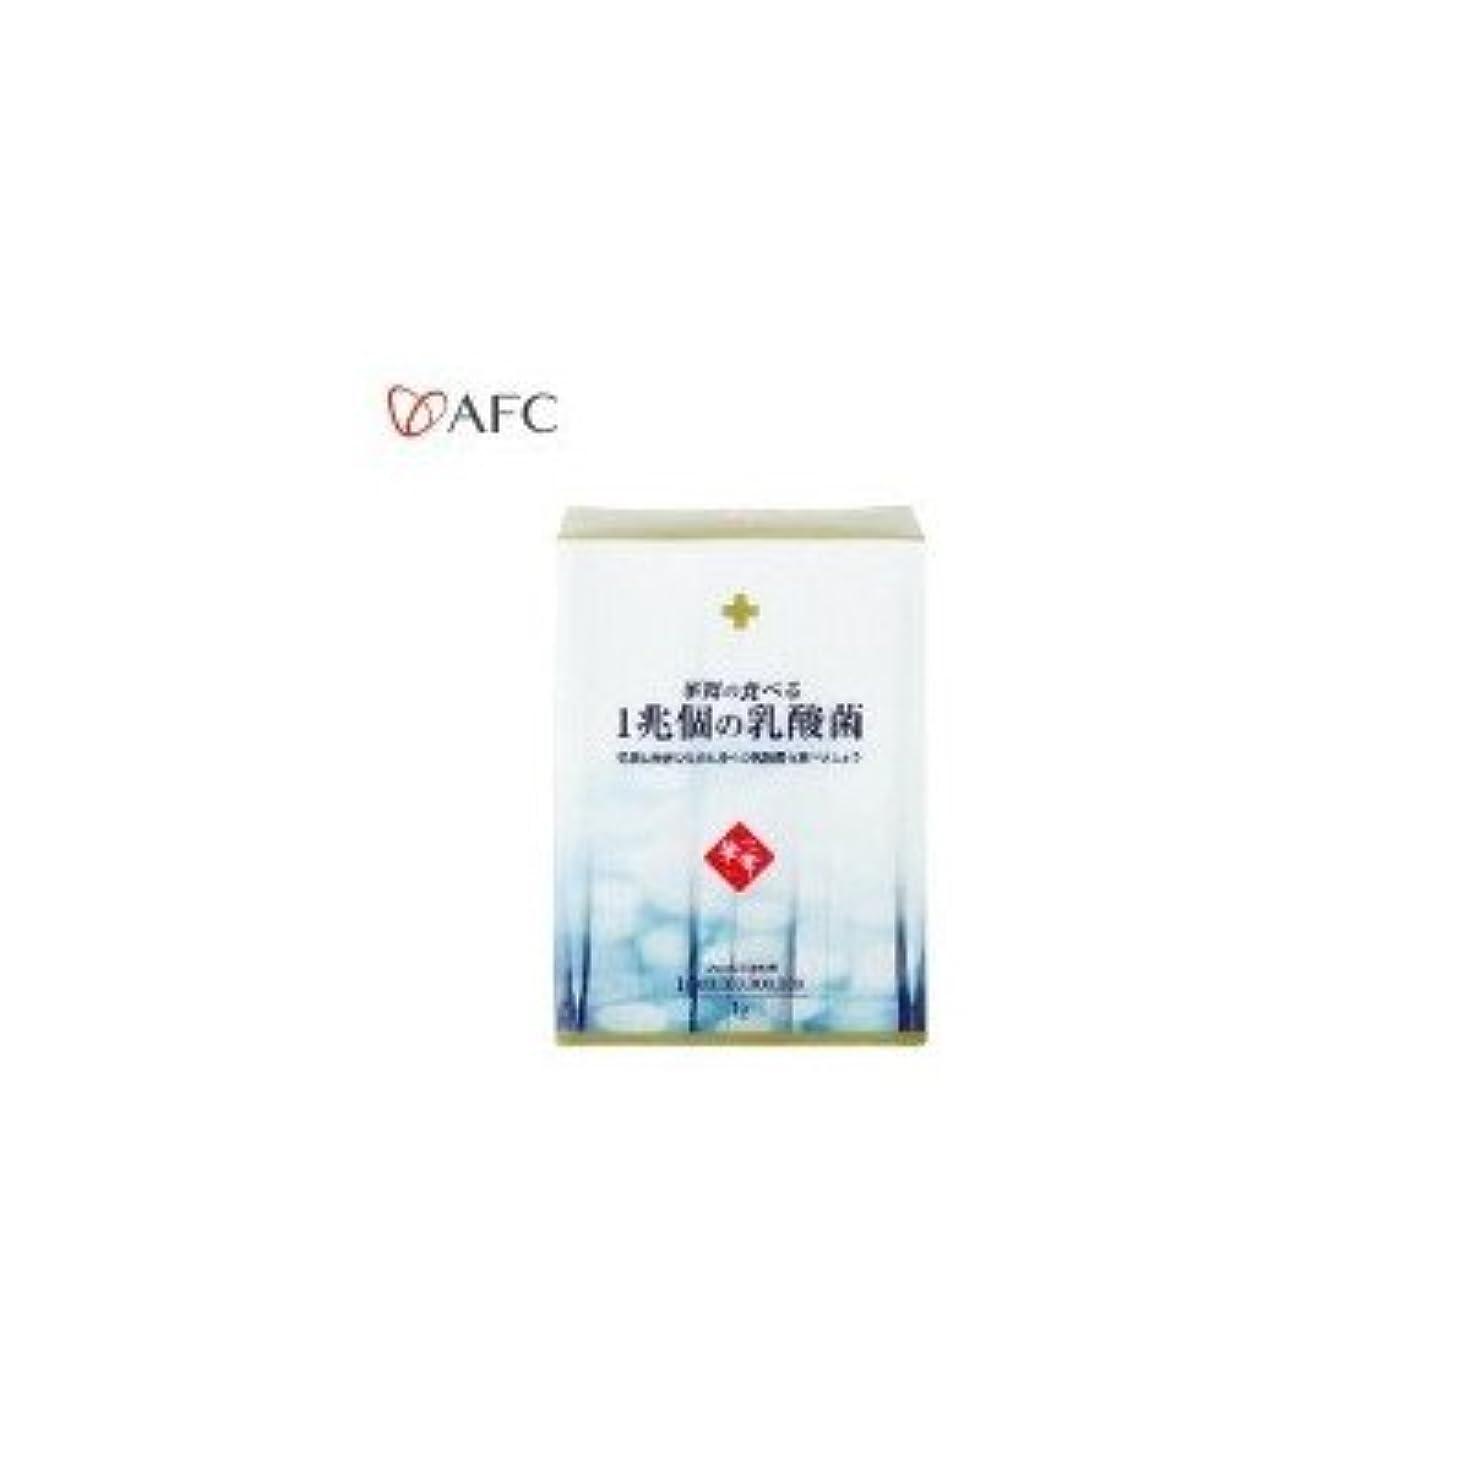 AFC 華舞シリーズ 華舞の1兆個の乳酸菌 スティックタイプ 30g(1g×30本) 3222 爽やかなヨーグルト 持ち運びにも便利なスティックタイプ